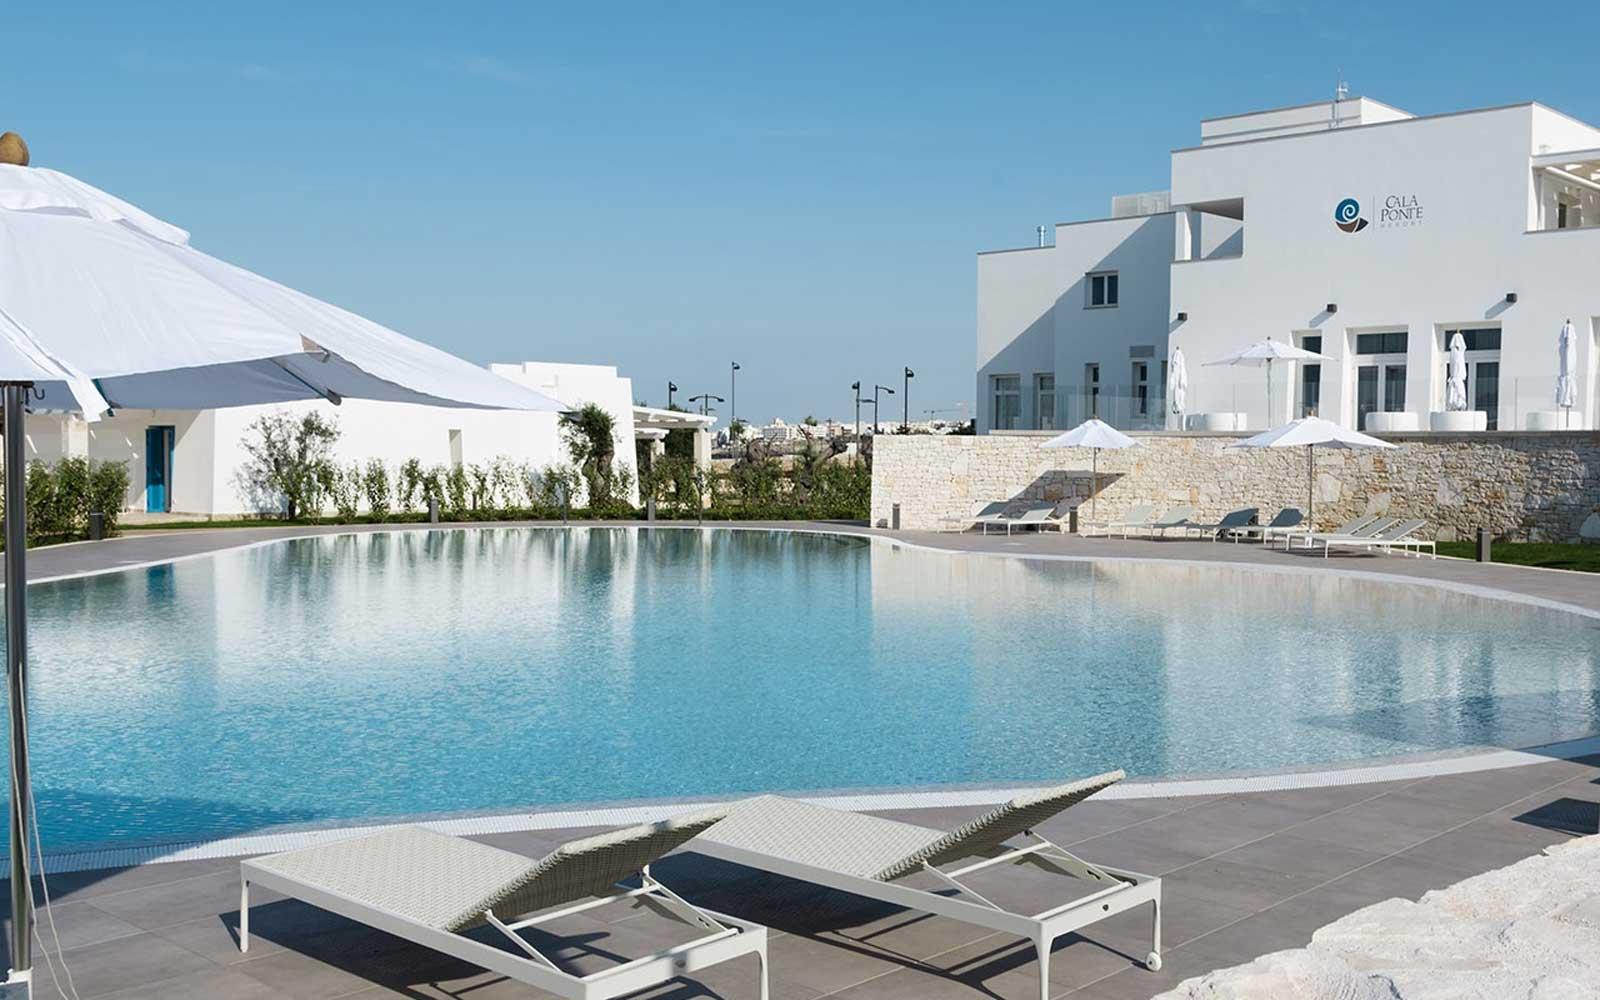 Poolside at Cala Ponte Hotel